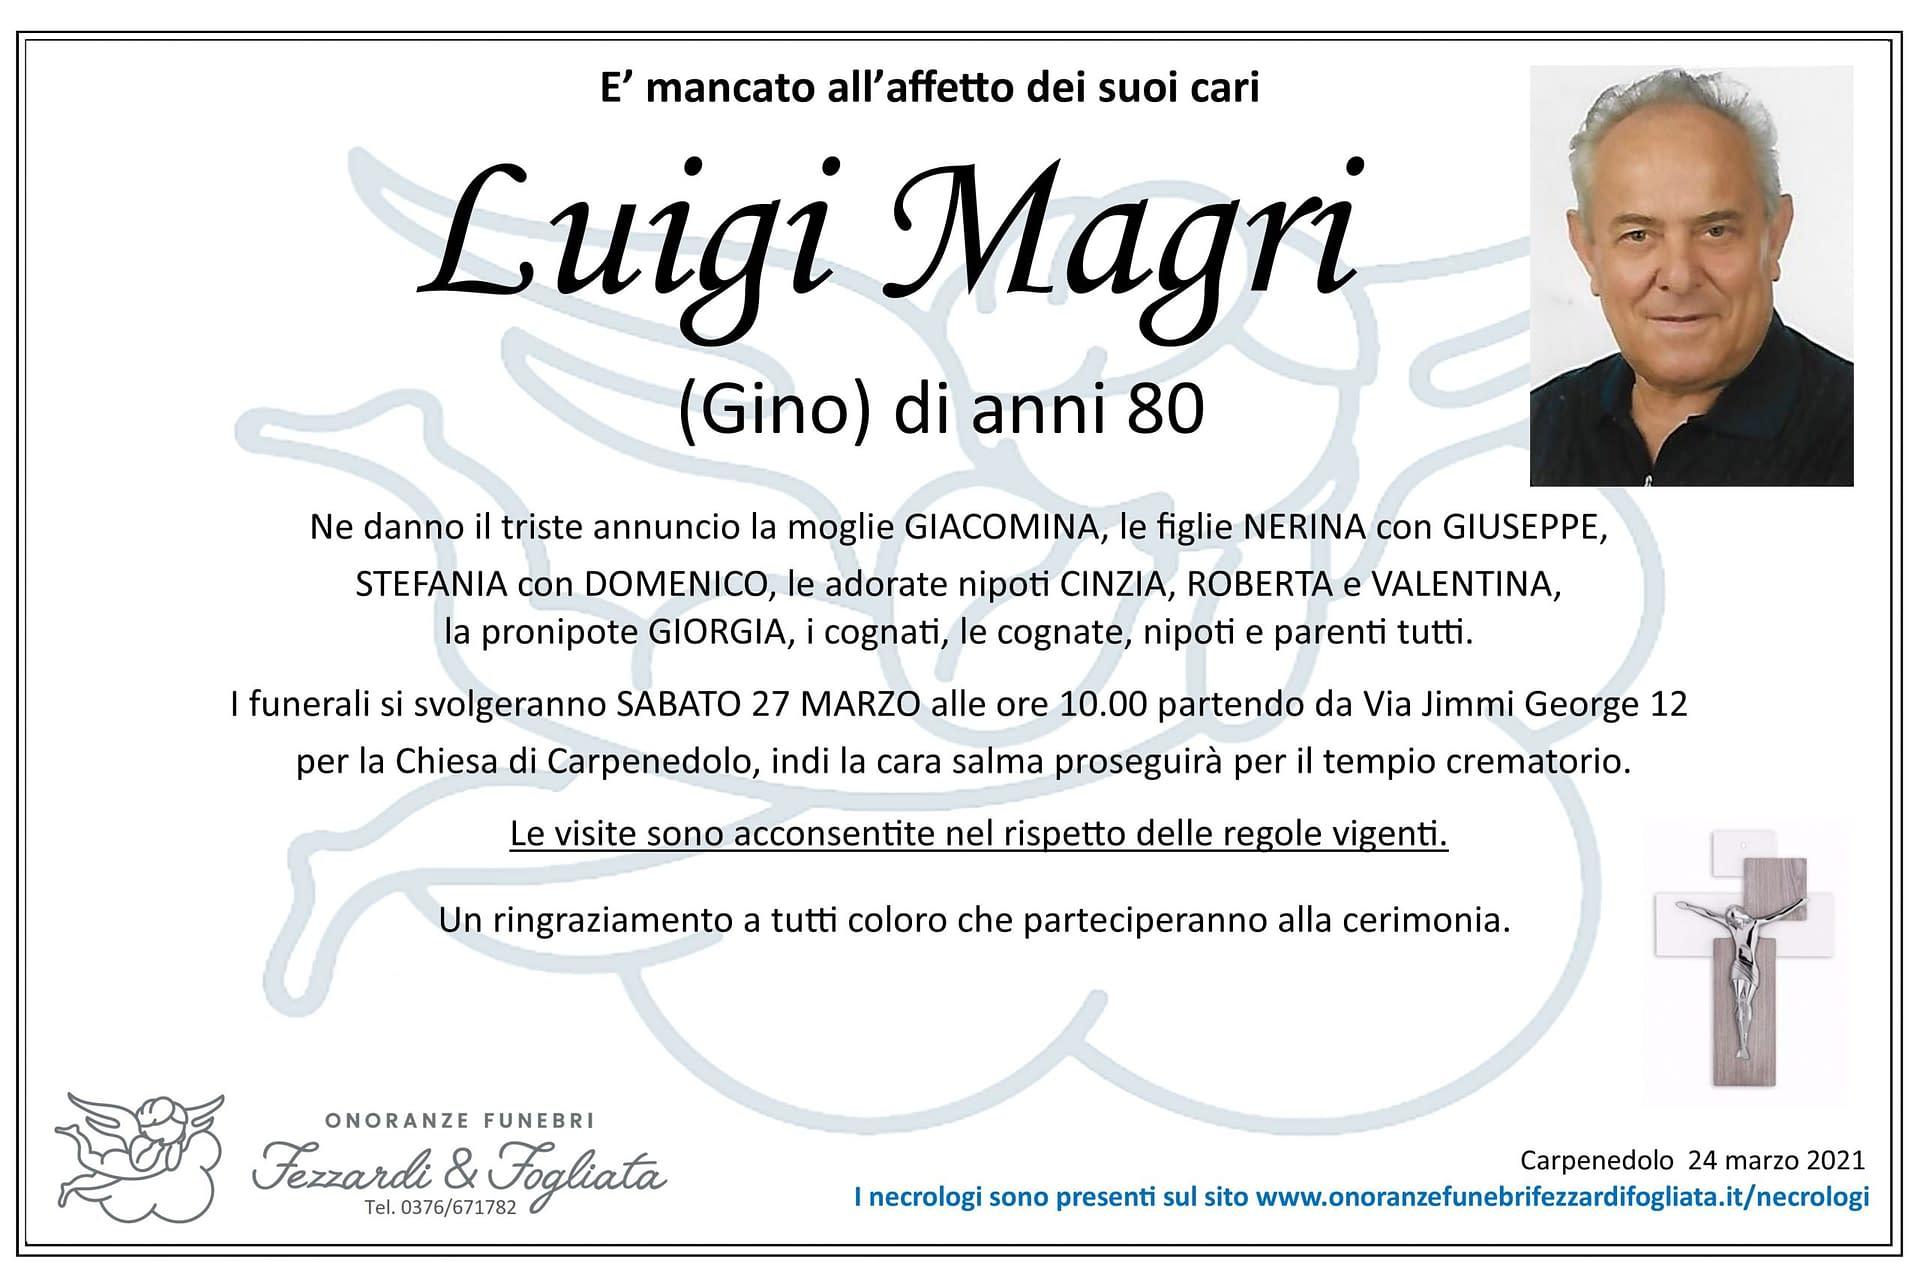 Necrologio Luigi Magri